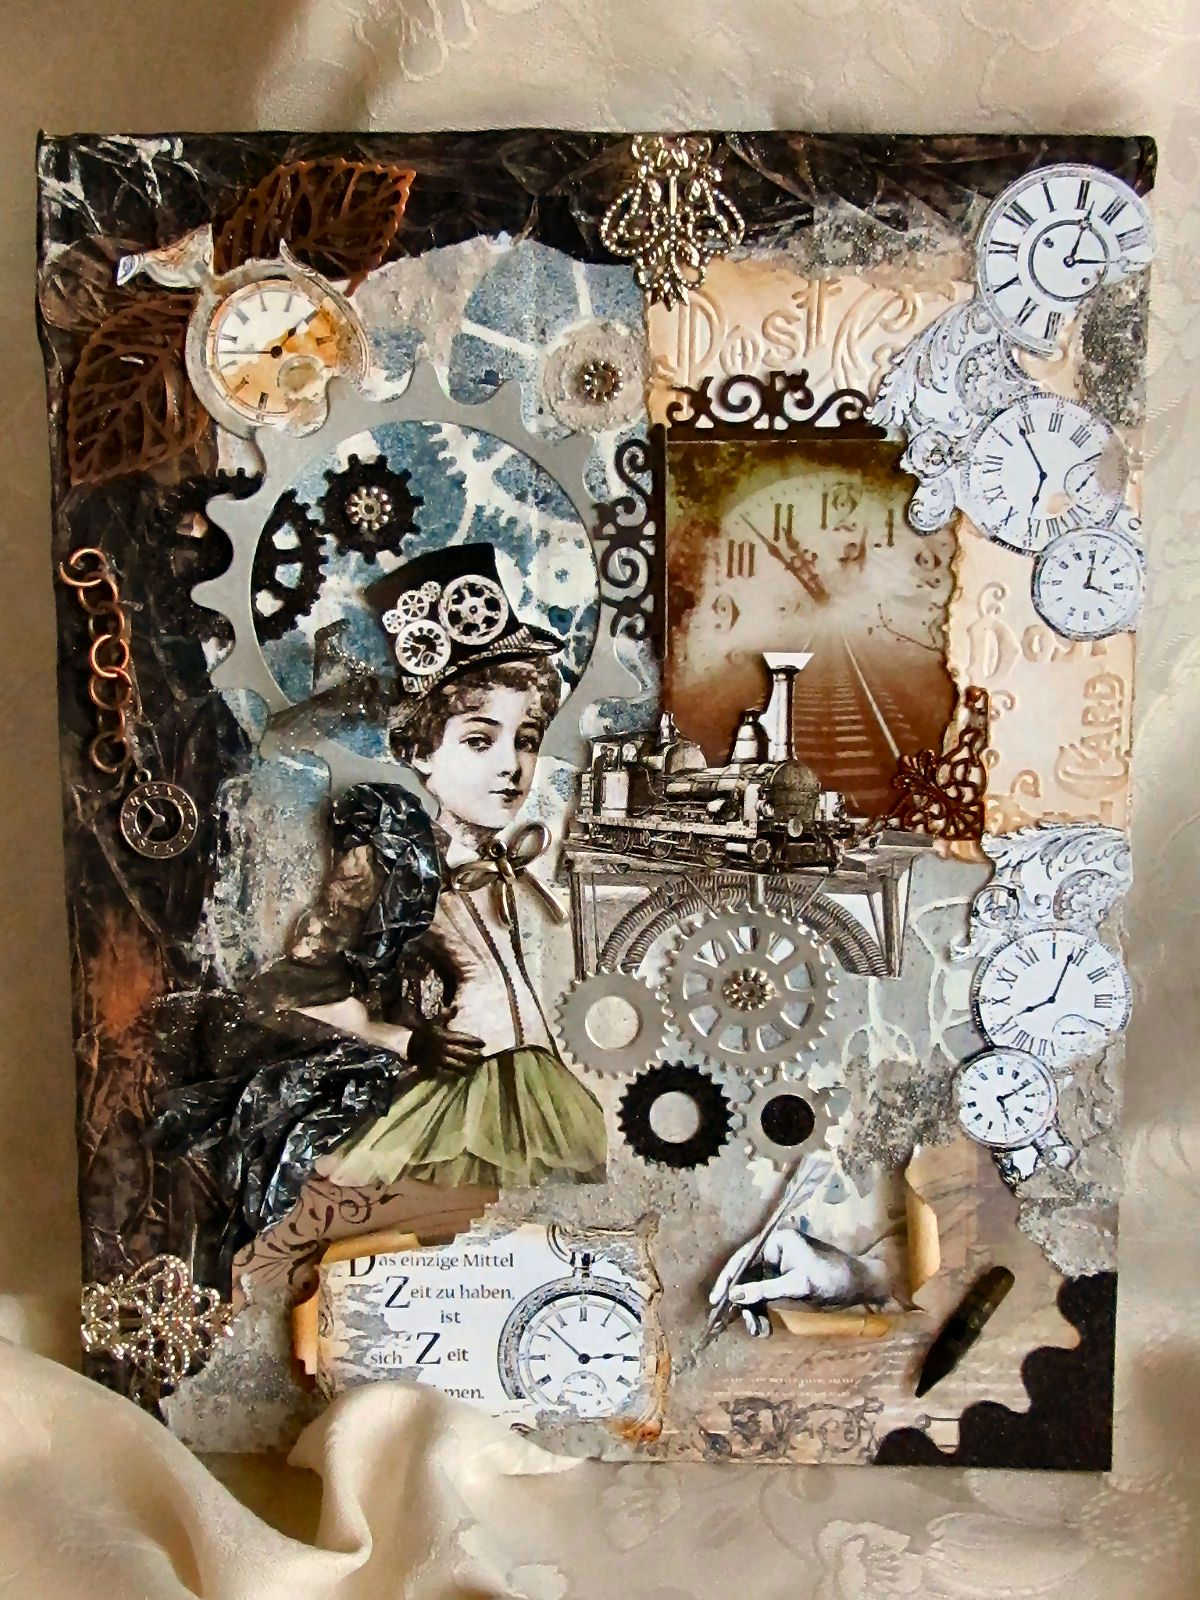 great collage w la blanche stamps la blanche stamps pinterest lablanche kartenkunst und. Black Bedroom Furniture Sets. Home Design Ideas